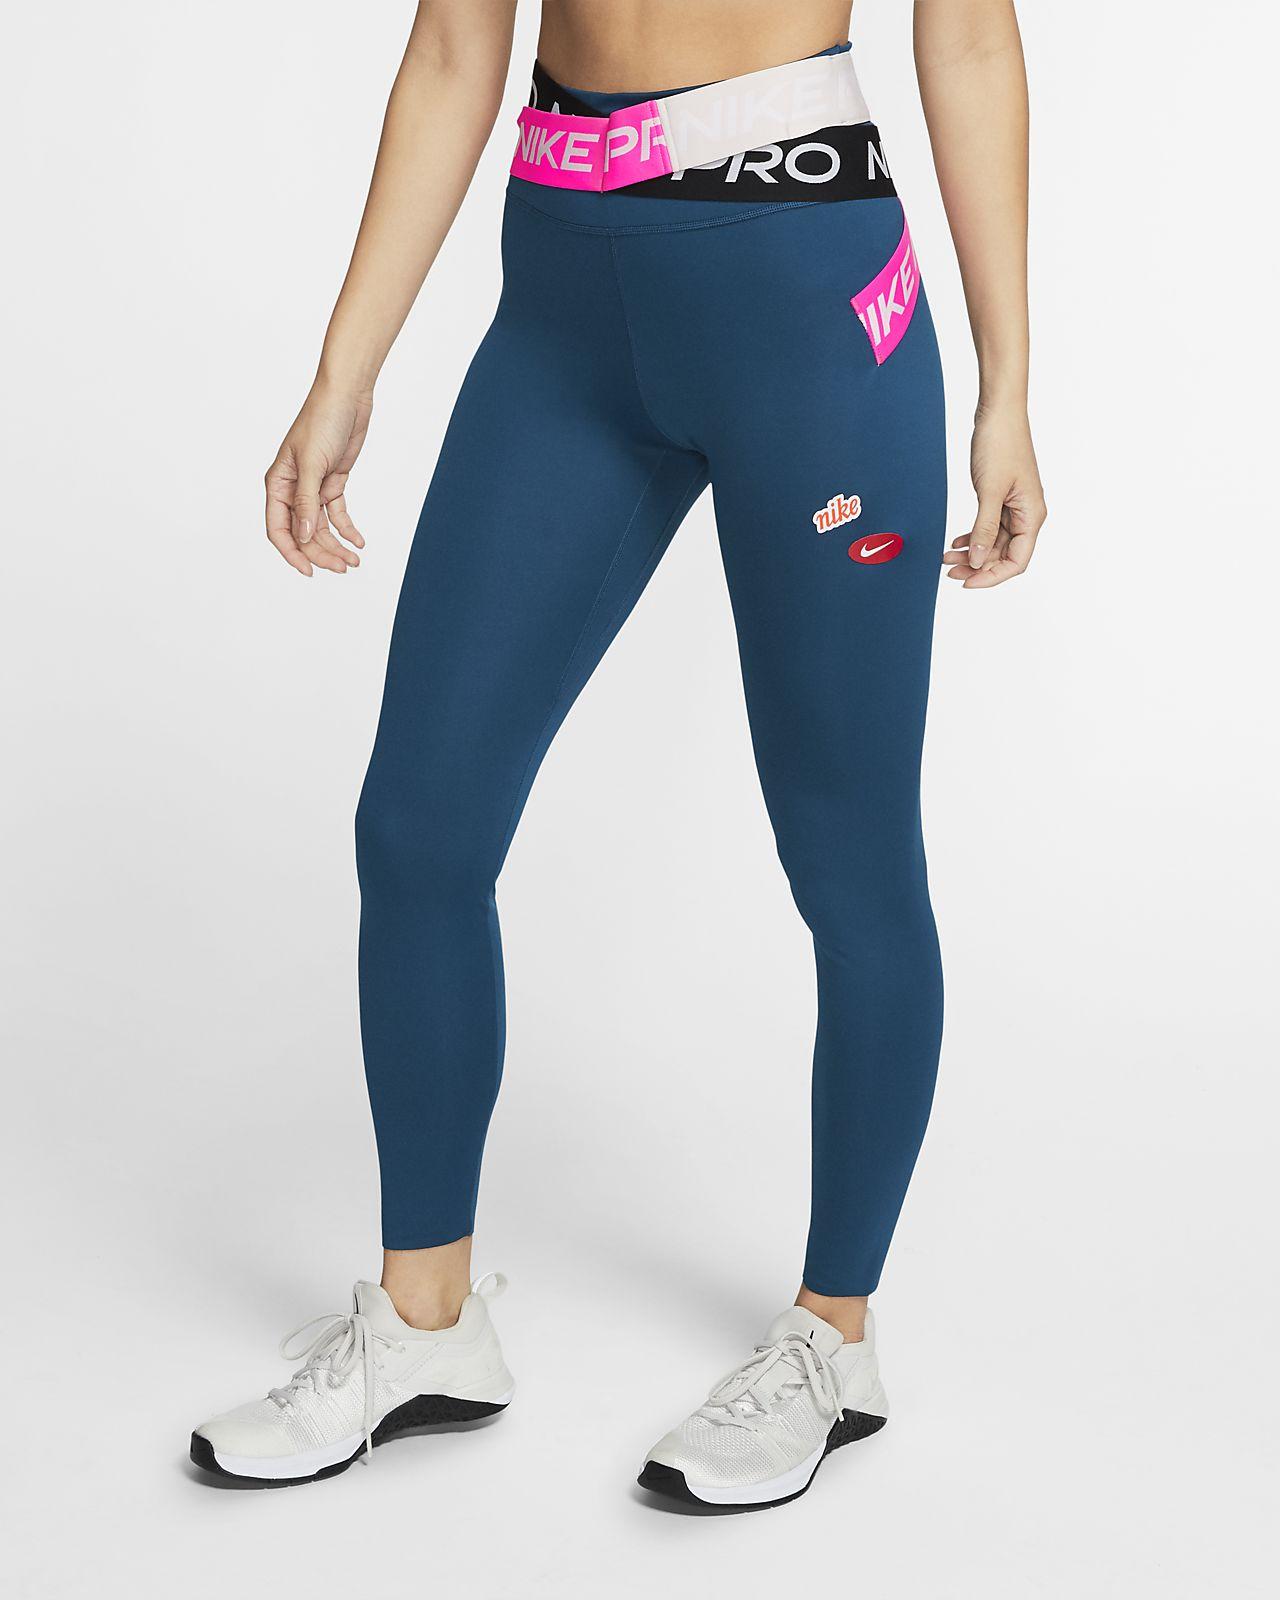 Legging Nike One Luxe Icon Clash pour Femme